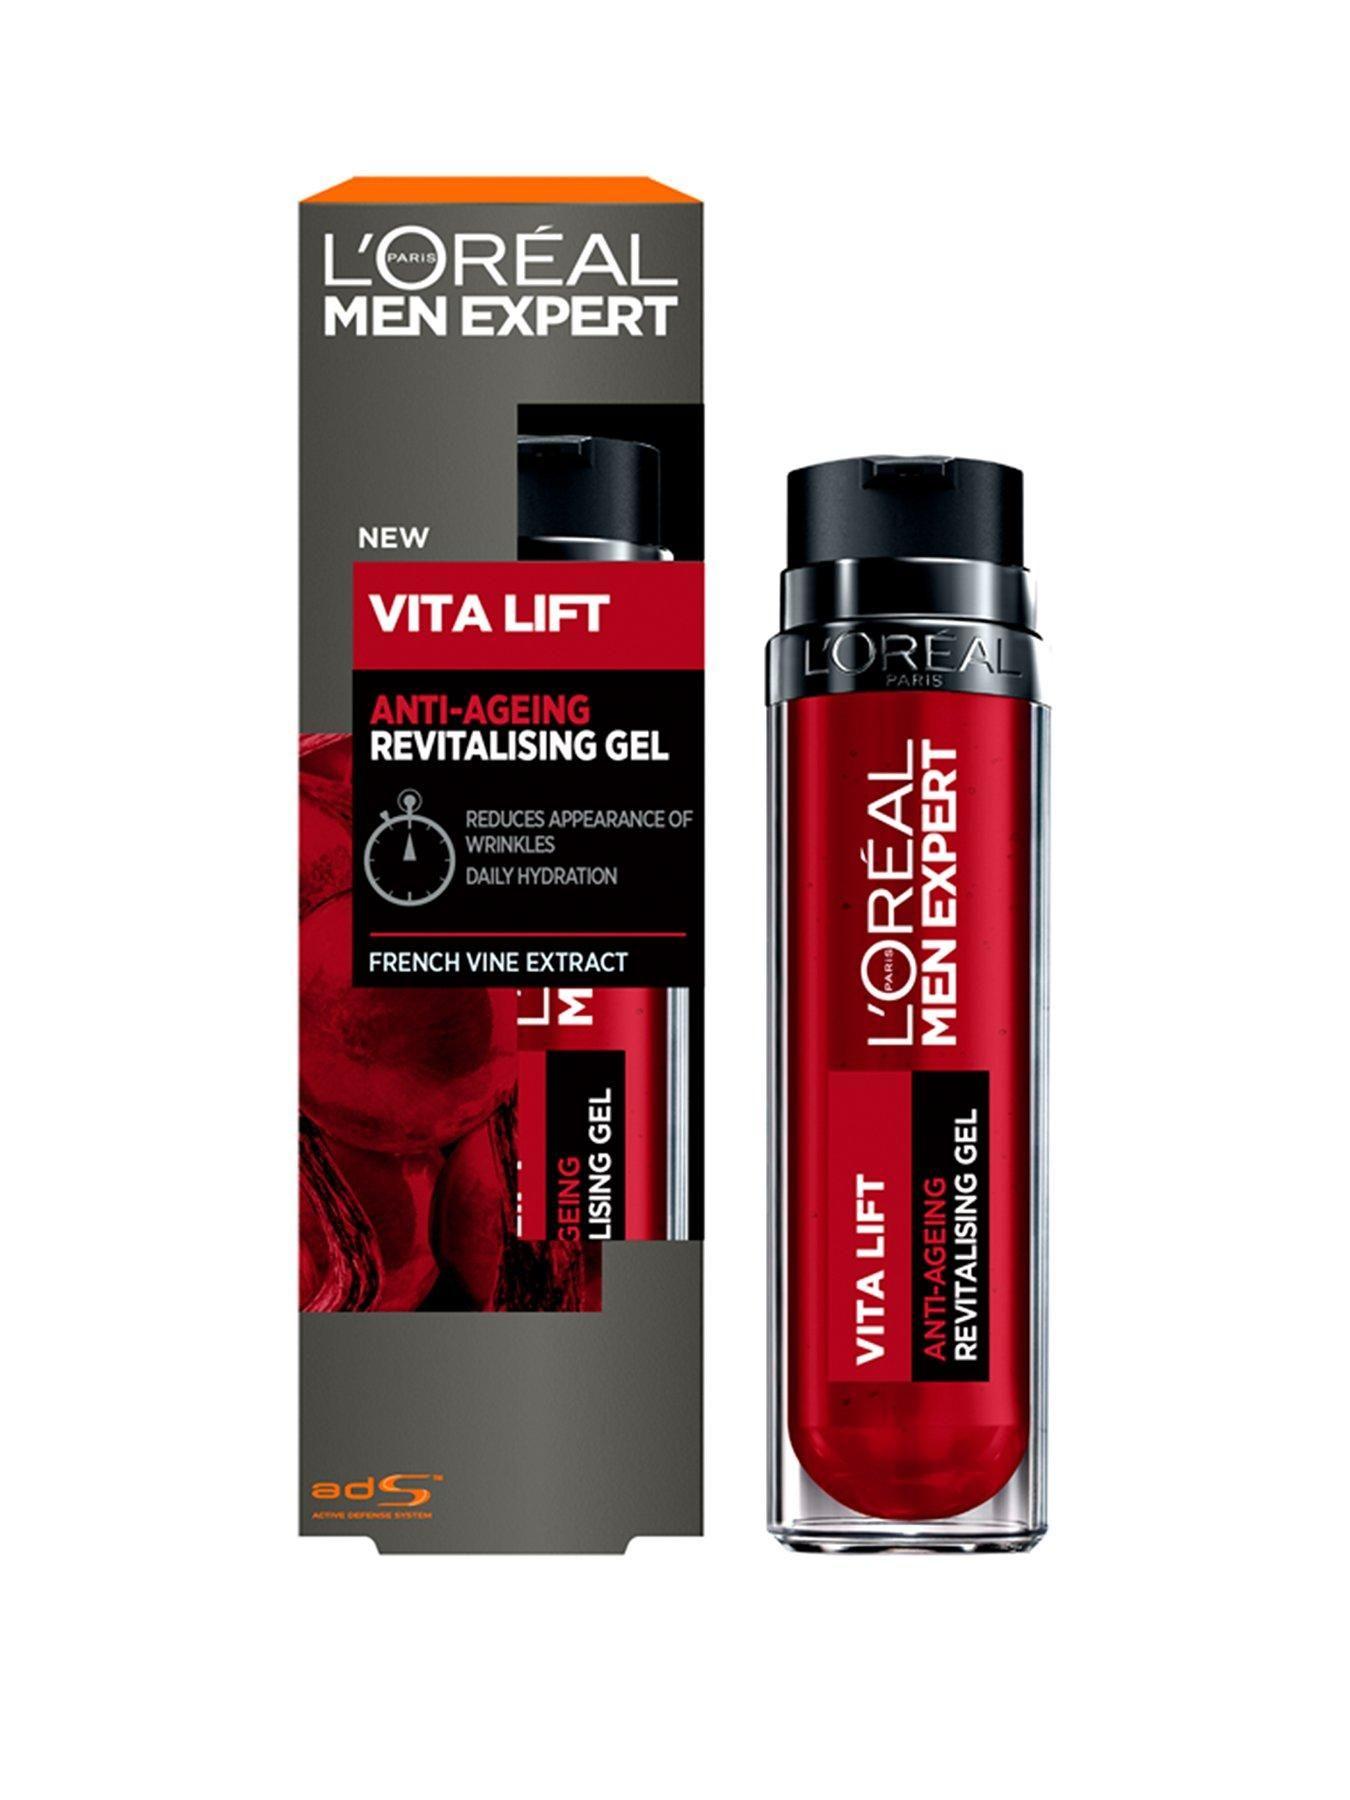 L Oreal Paris Men Expert Vitalift Anti Wrinkle Gel Moisturiser 50ml In One Colour Loreal Paris Moisturizer Anti Wrinkle